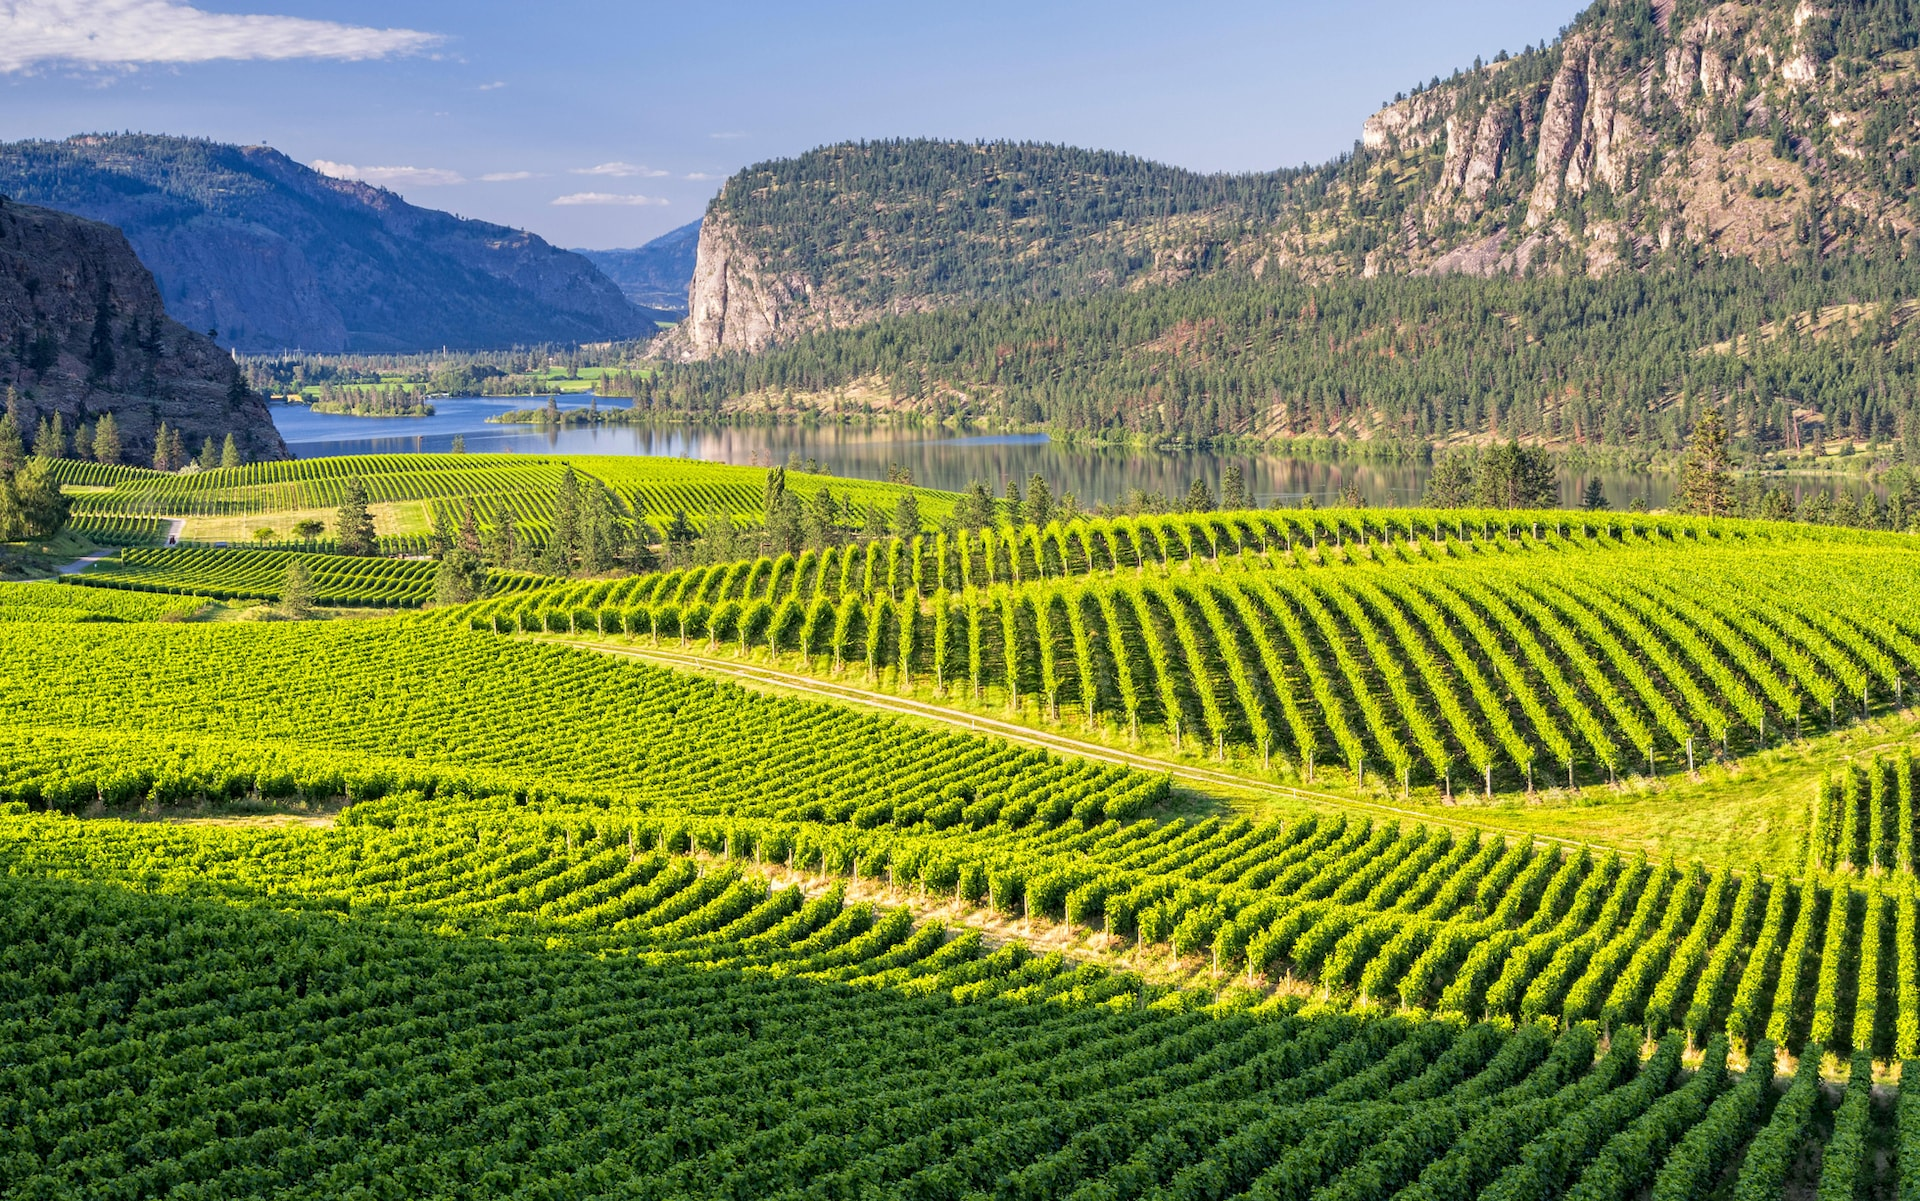 vineyard-okanagan-valley-canada